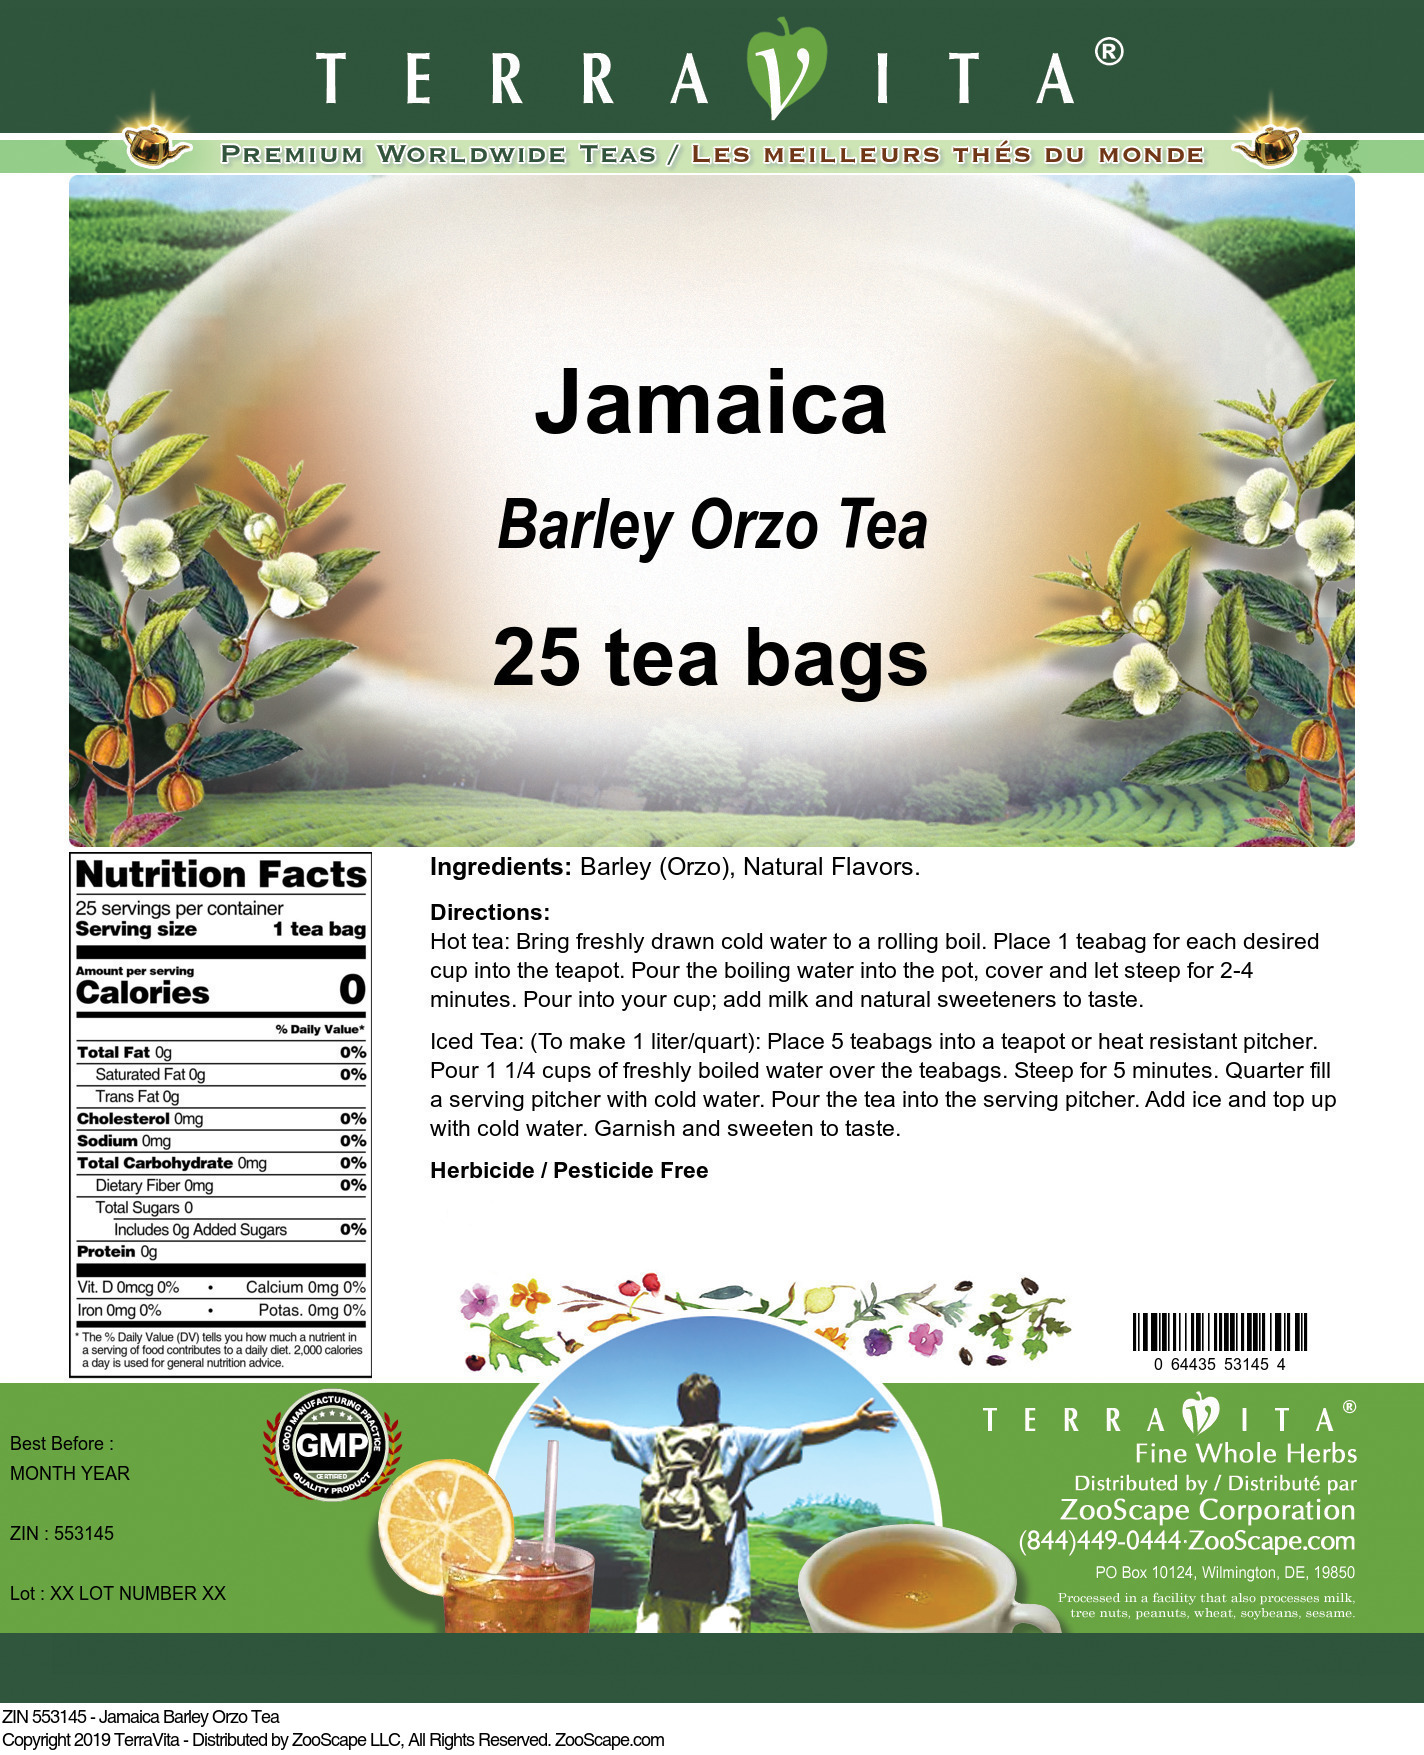 Jamaica Barley Orzo